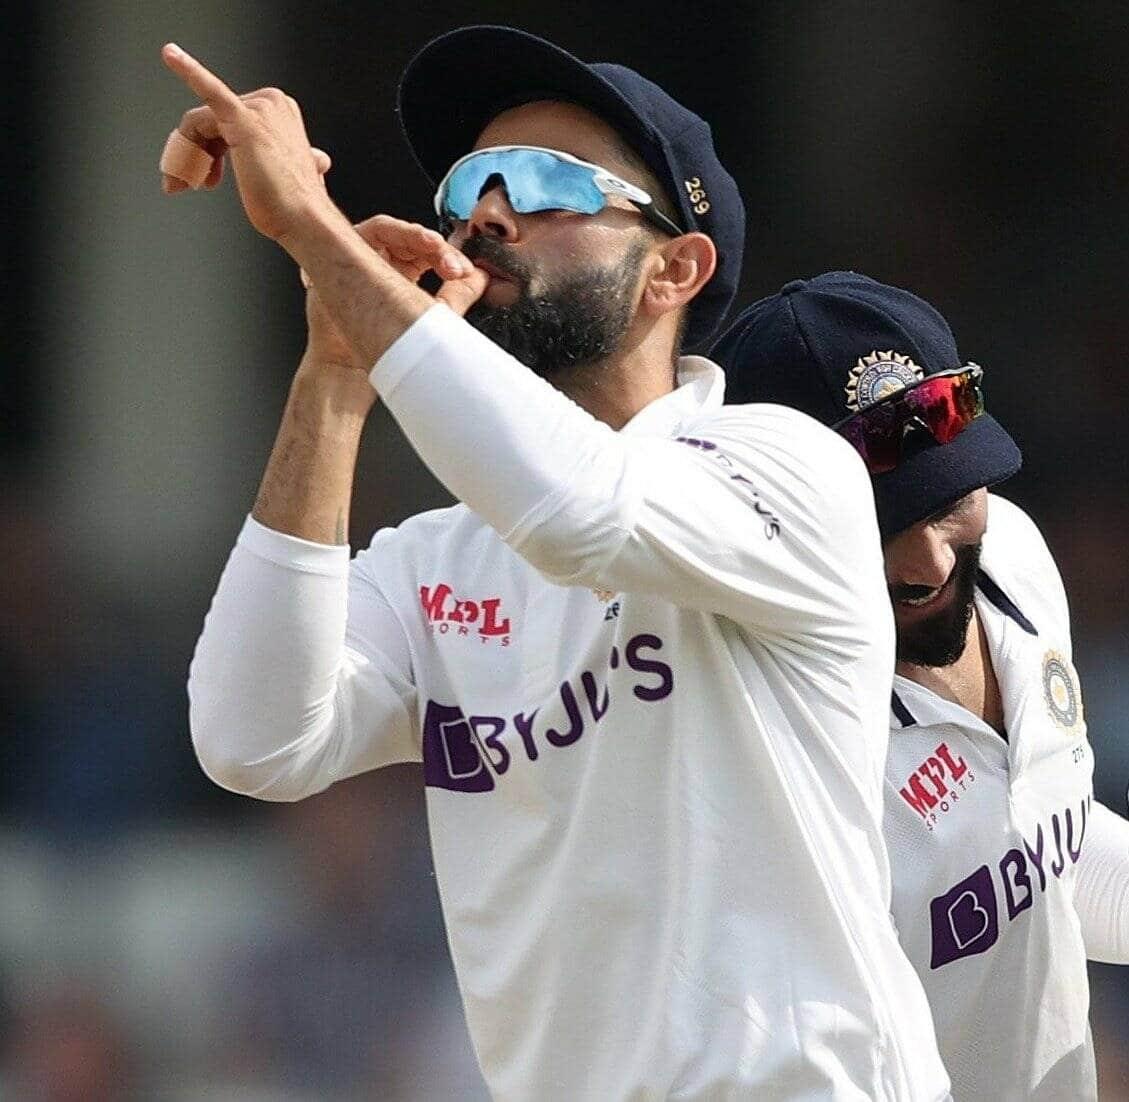 Virat kohli Celebration is Classless says Fox Cricket Wasim Jaffer Slams them with epic reply